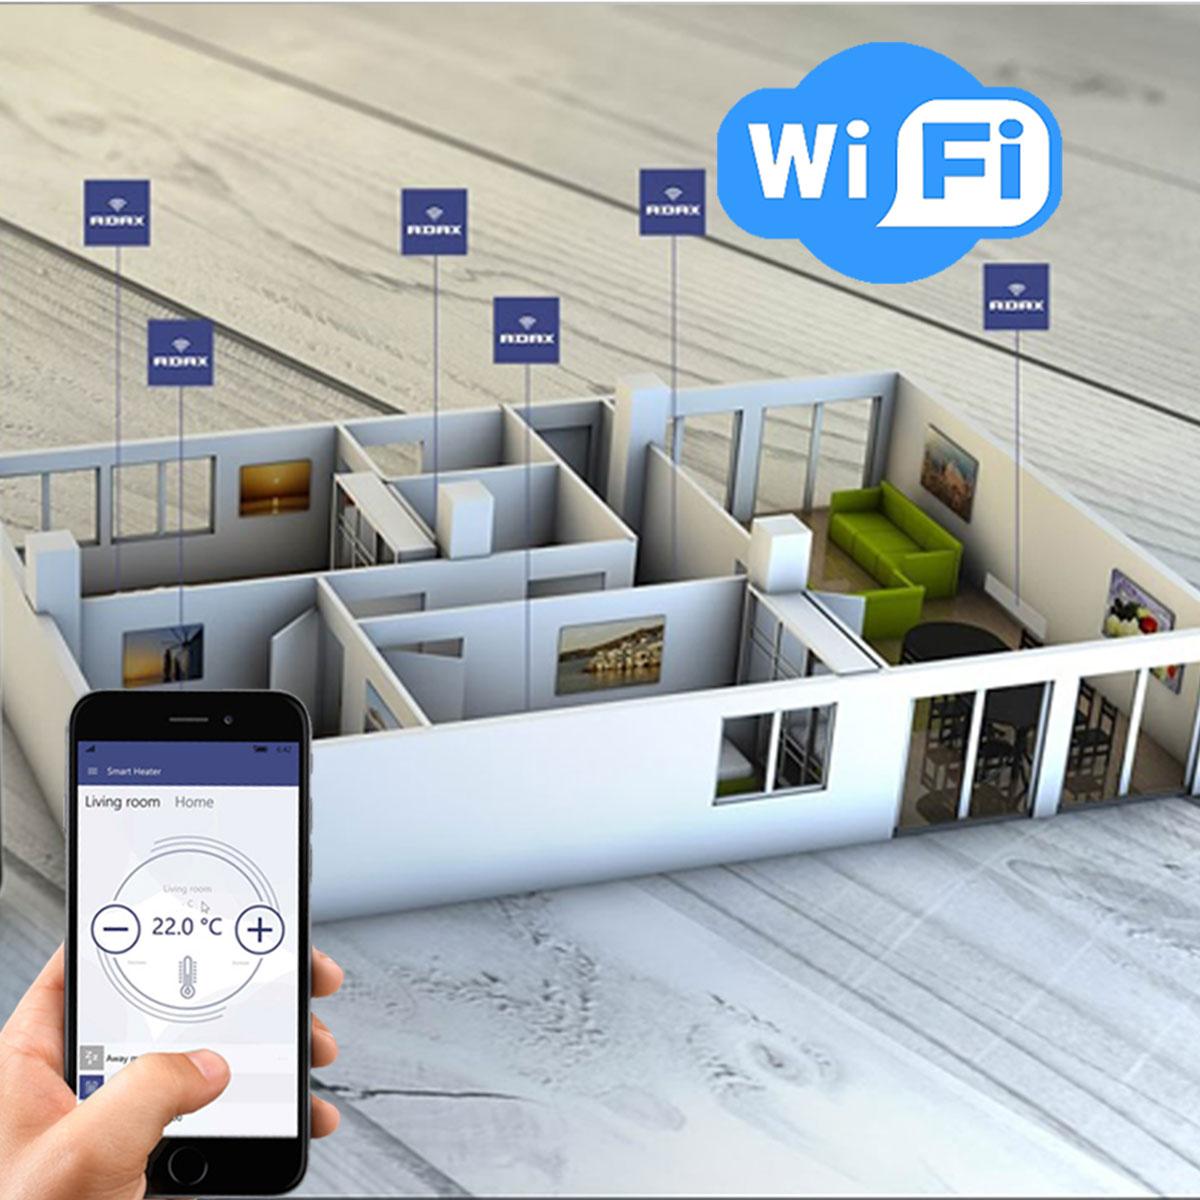 Pametna generacija ADAX NEO WiFi norveških radijatora